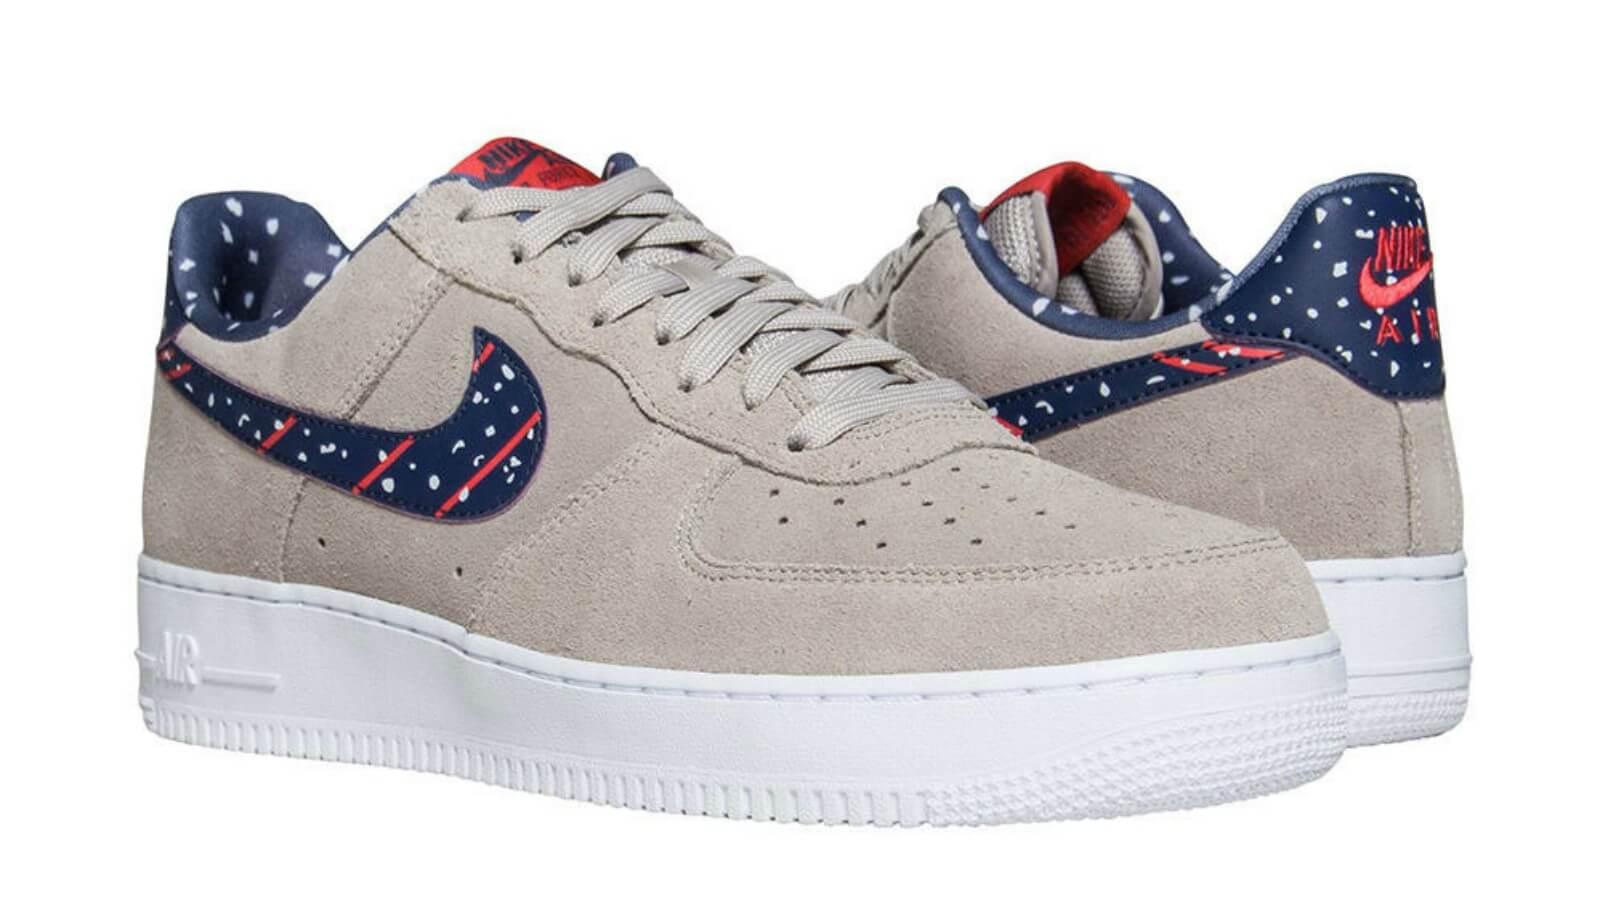 Los Nike Air Huarache y Air Force 1 Low NASA